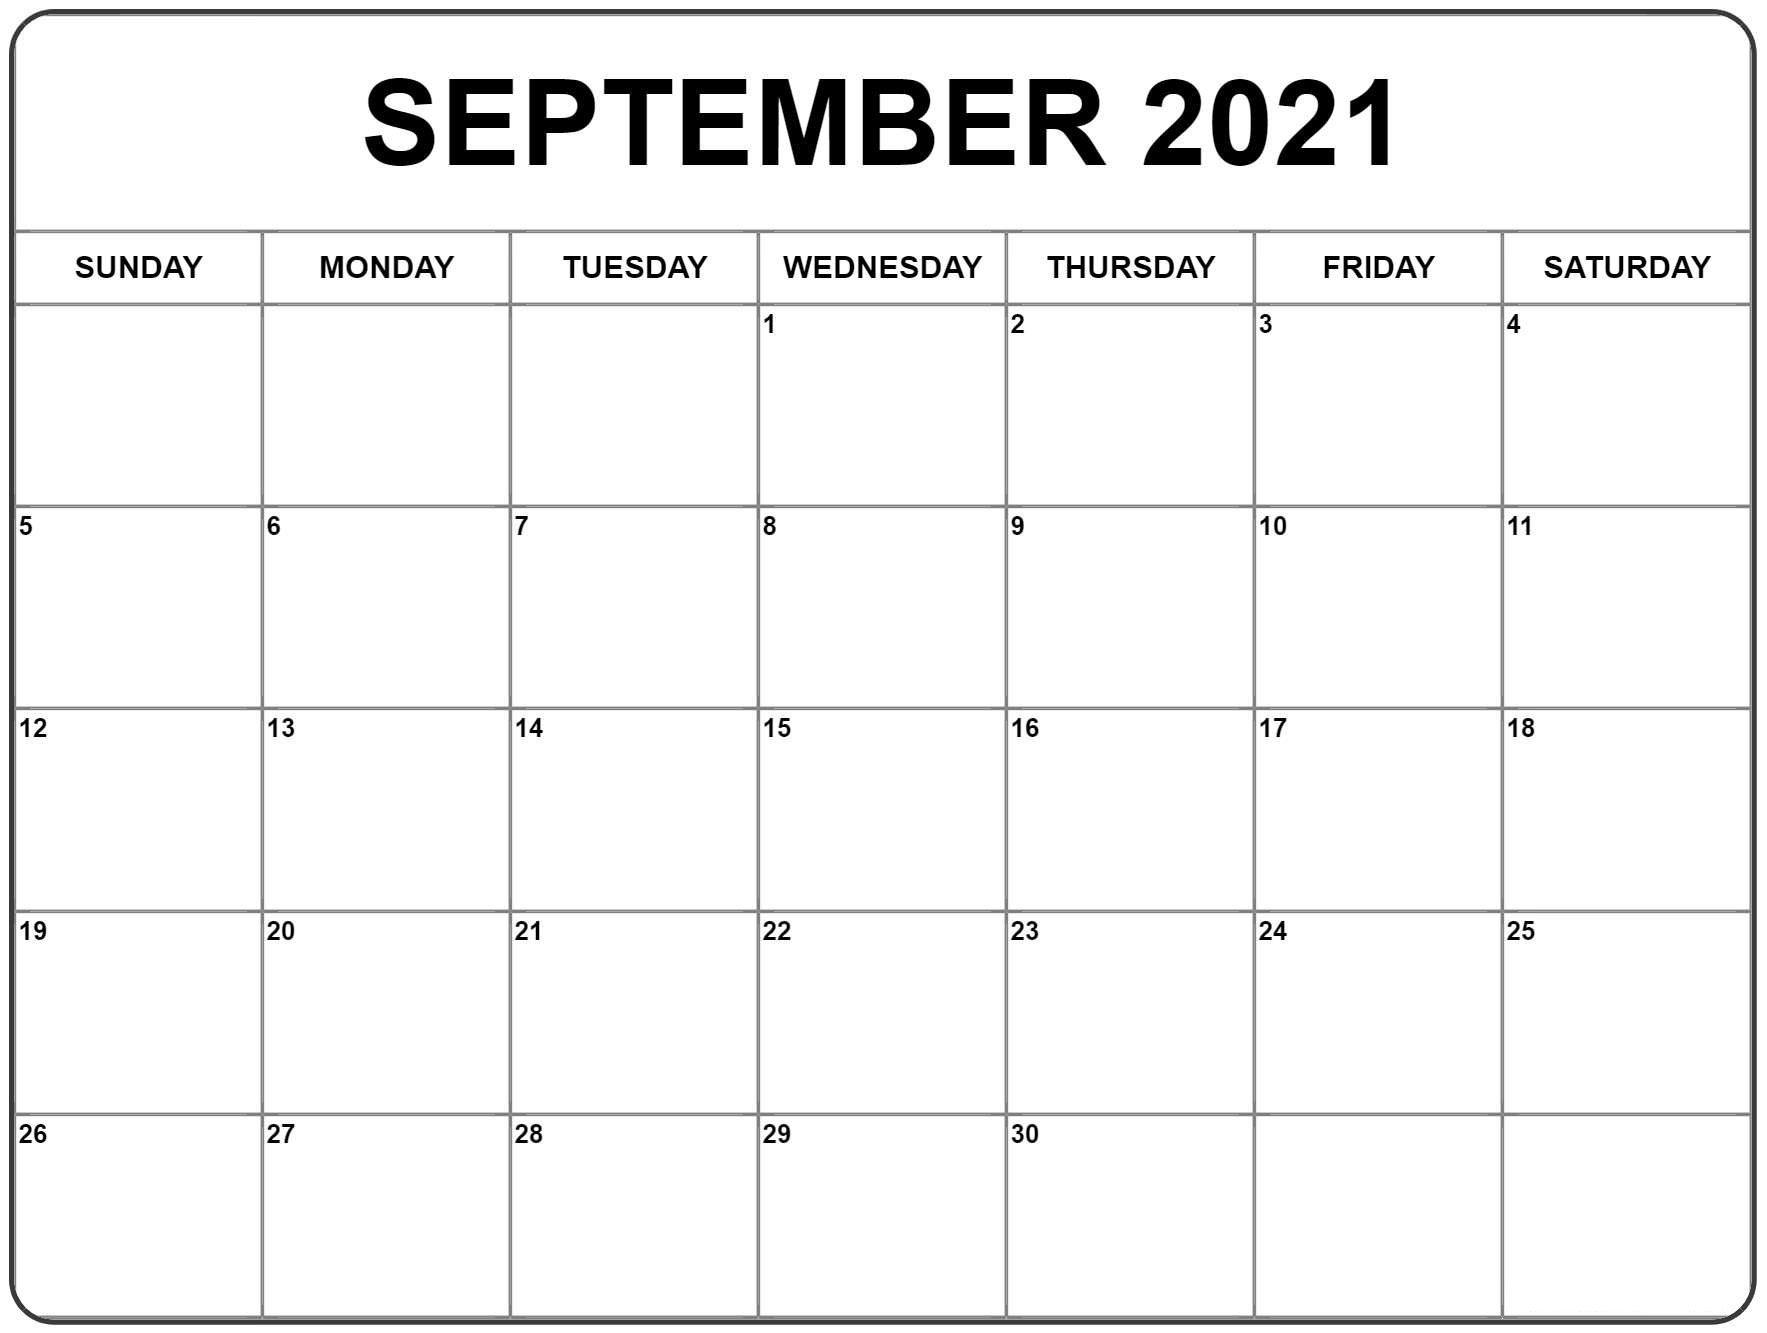 September 2021 Calendar | Monthly Calendar Printable